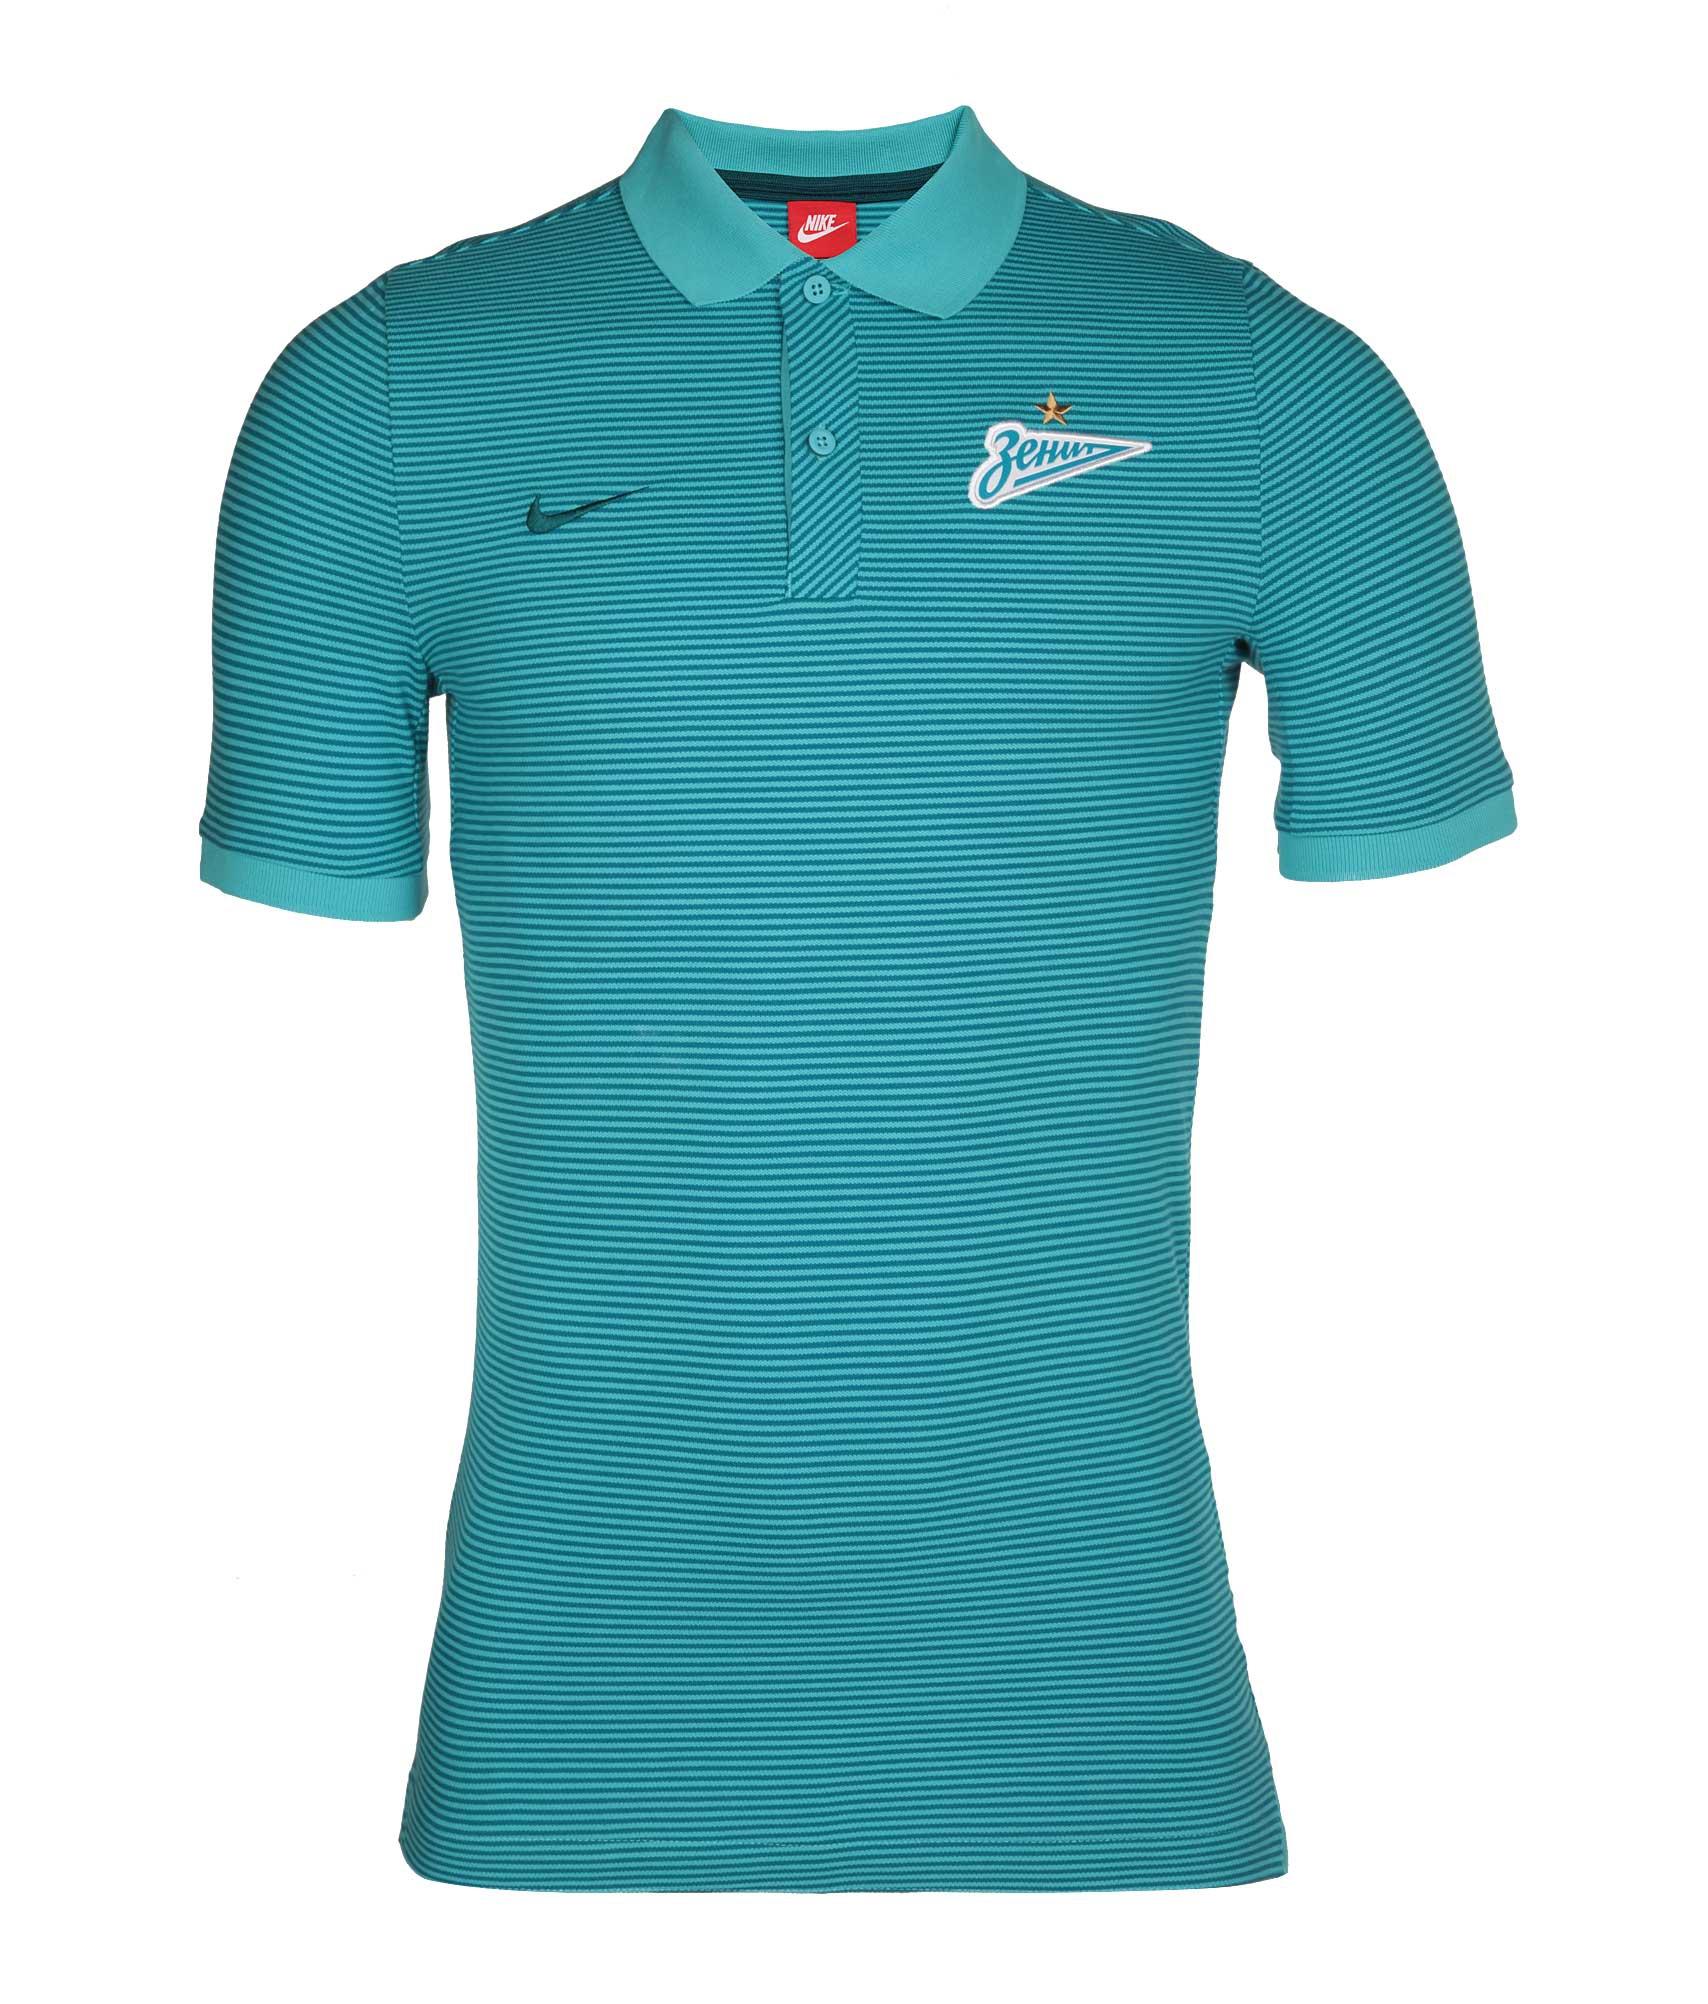 Поло Nike, Размер-S поло nike цвет голубой размер m